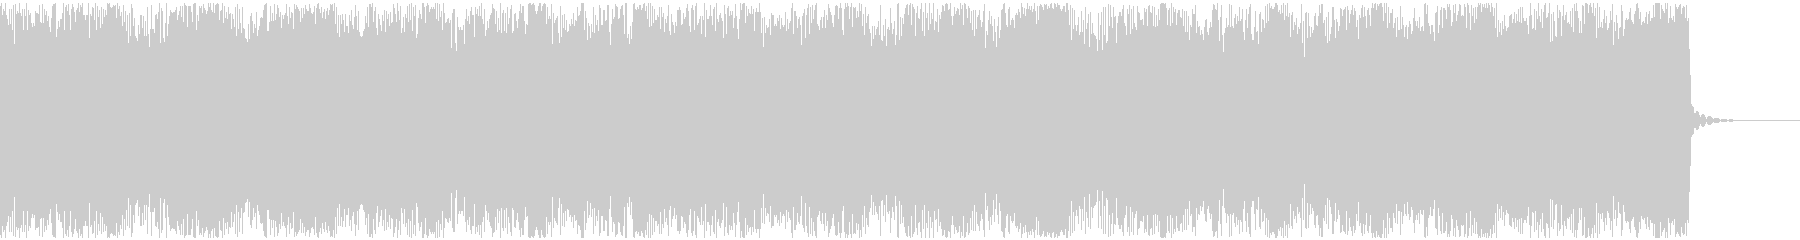 【EDM】7秒、ジングル1の未再生の波形